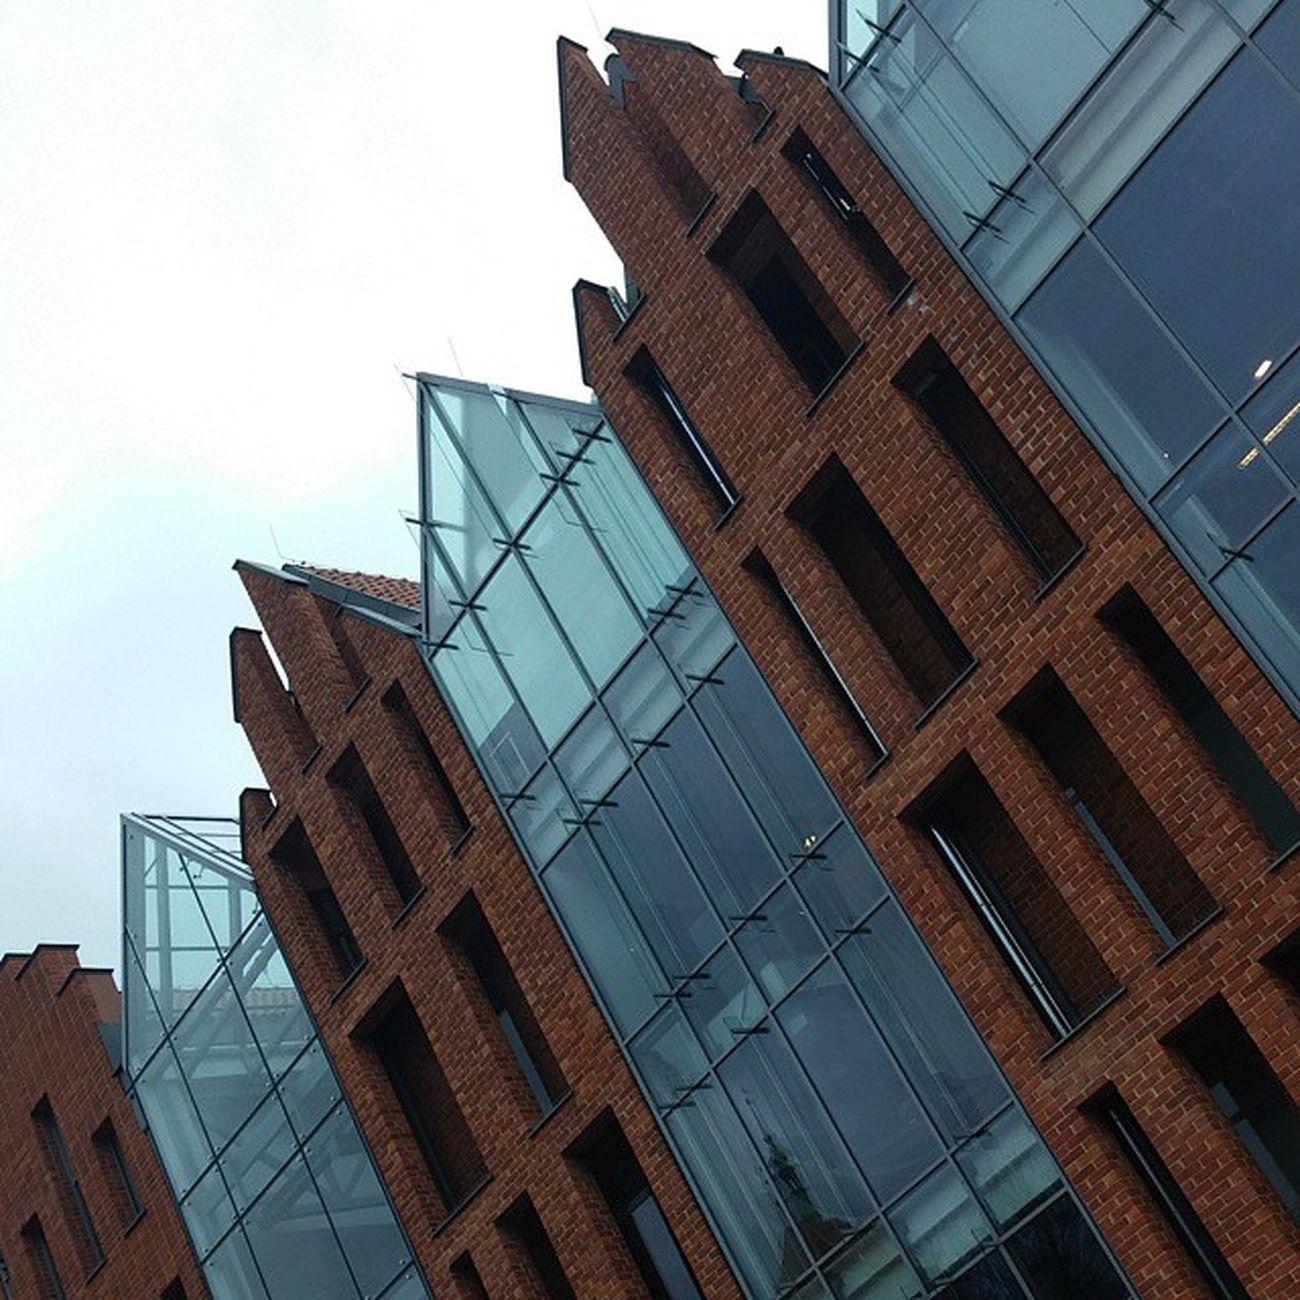 Modern Gdańsk Modern Building Redbricks Glass architecturelovers architecture architectureporn architecturephotography downtown oldtown instalike instagood city travel travelling journey Gdansk Poland